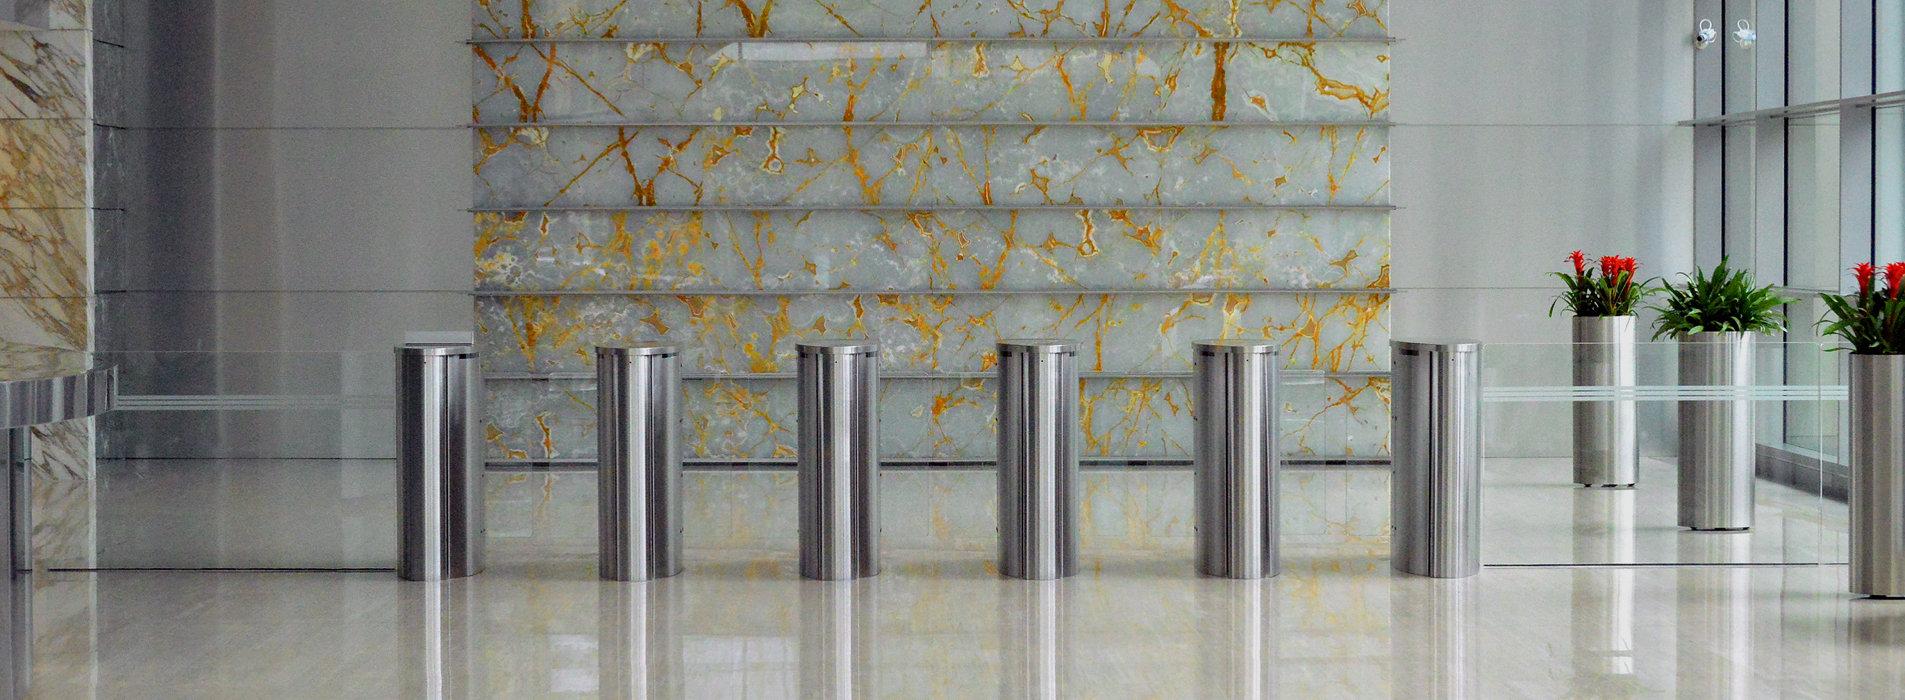 cristallisation-renovation-sol-marbre